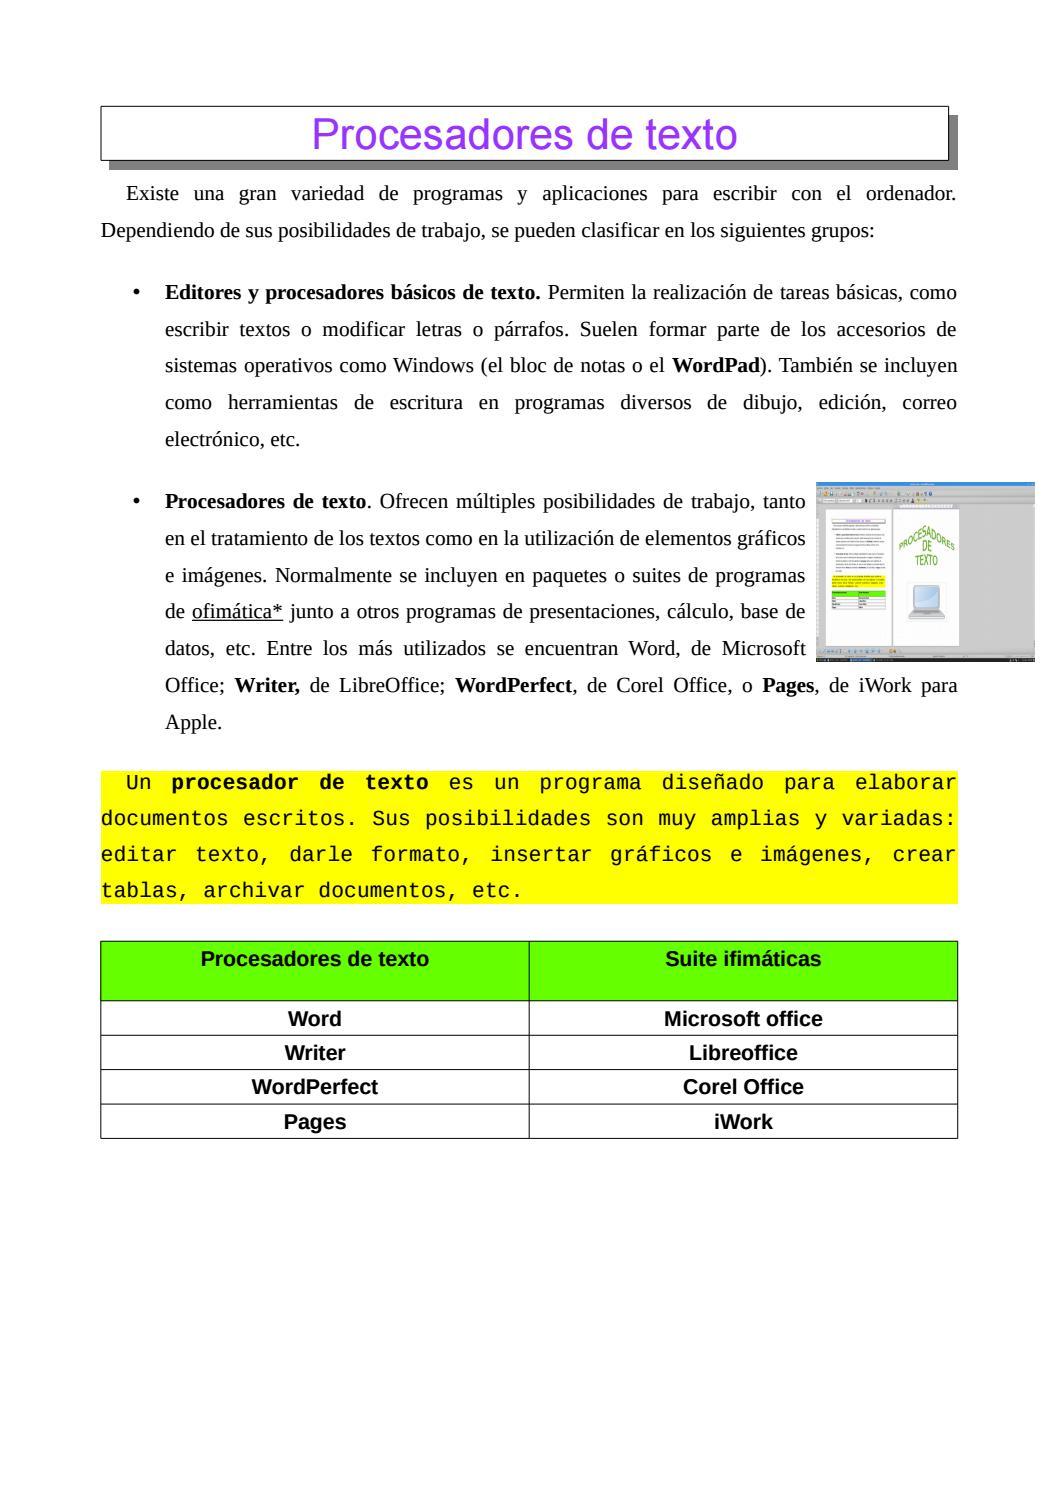 Trabajo Procesadores De Texto By Patricia Thegirlxp Issuu